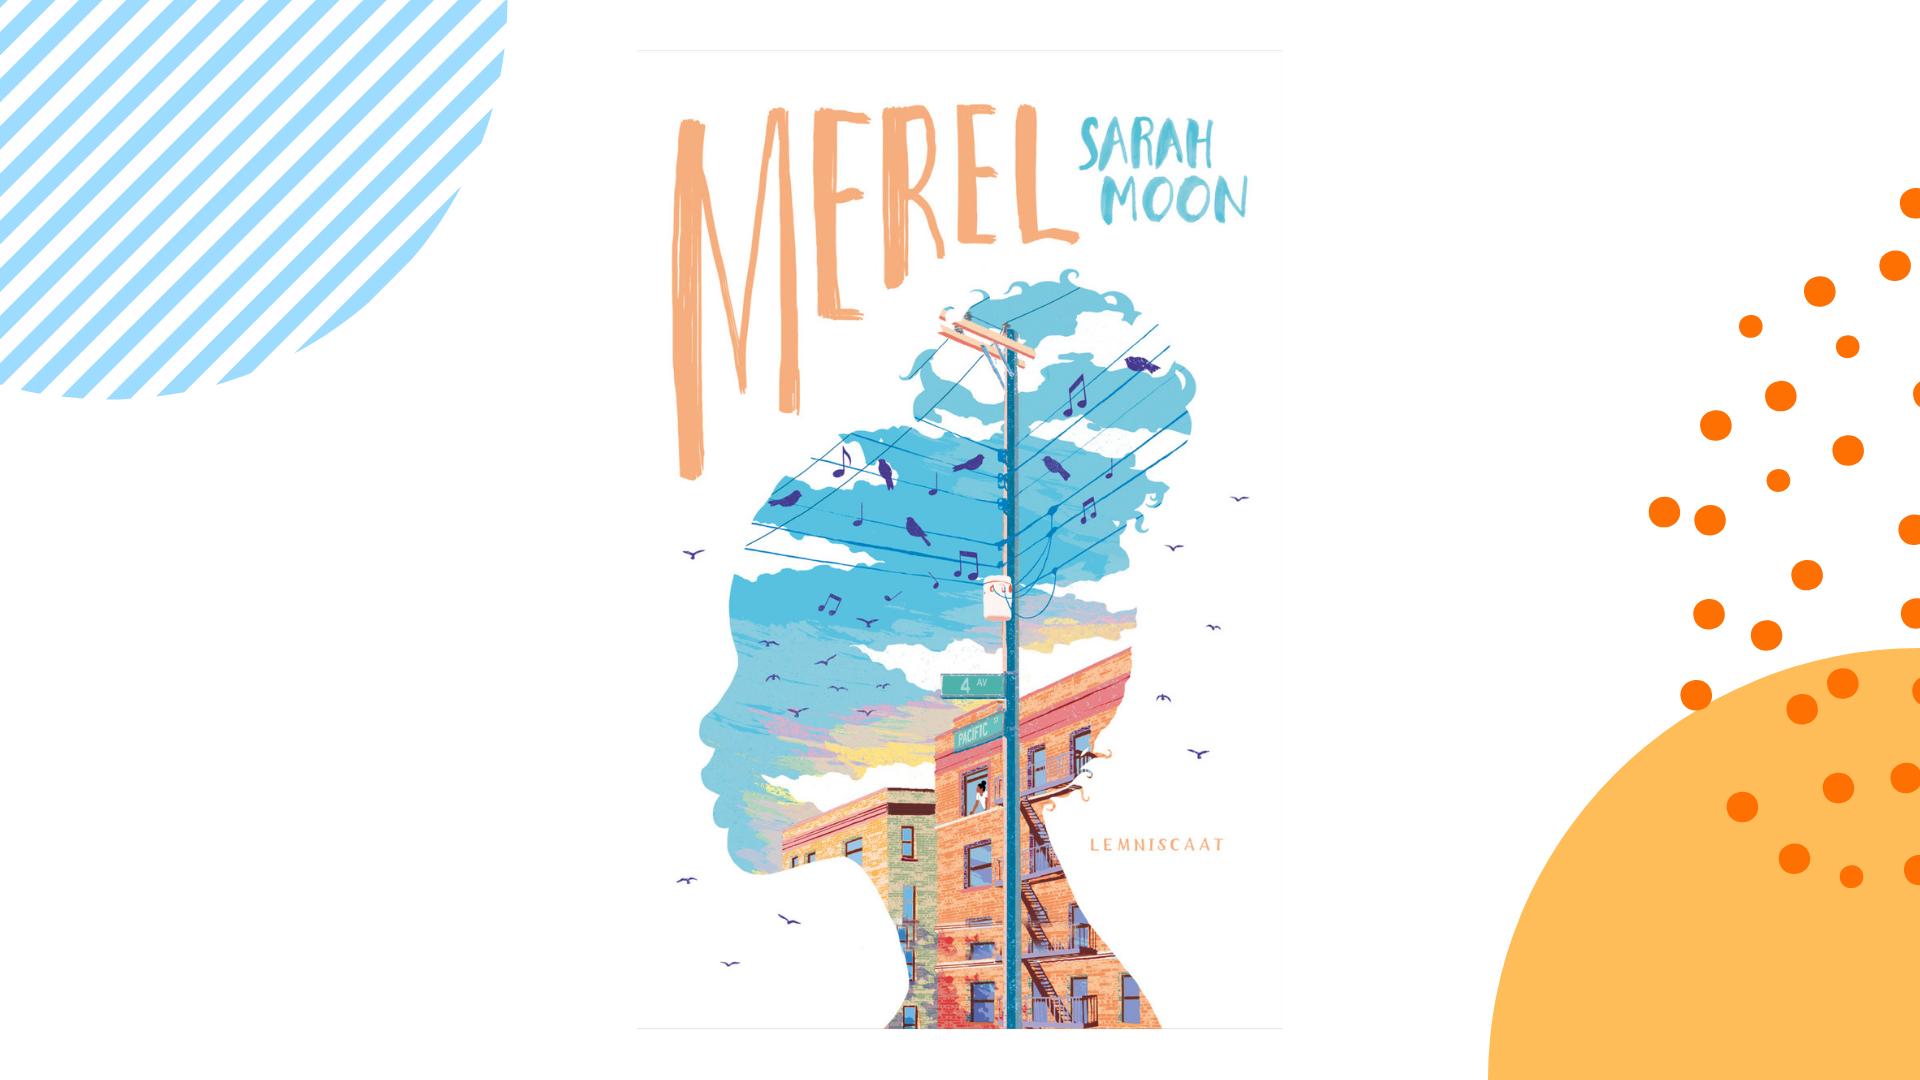 Merel Sarah Moon recensie